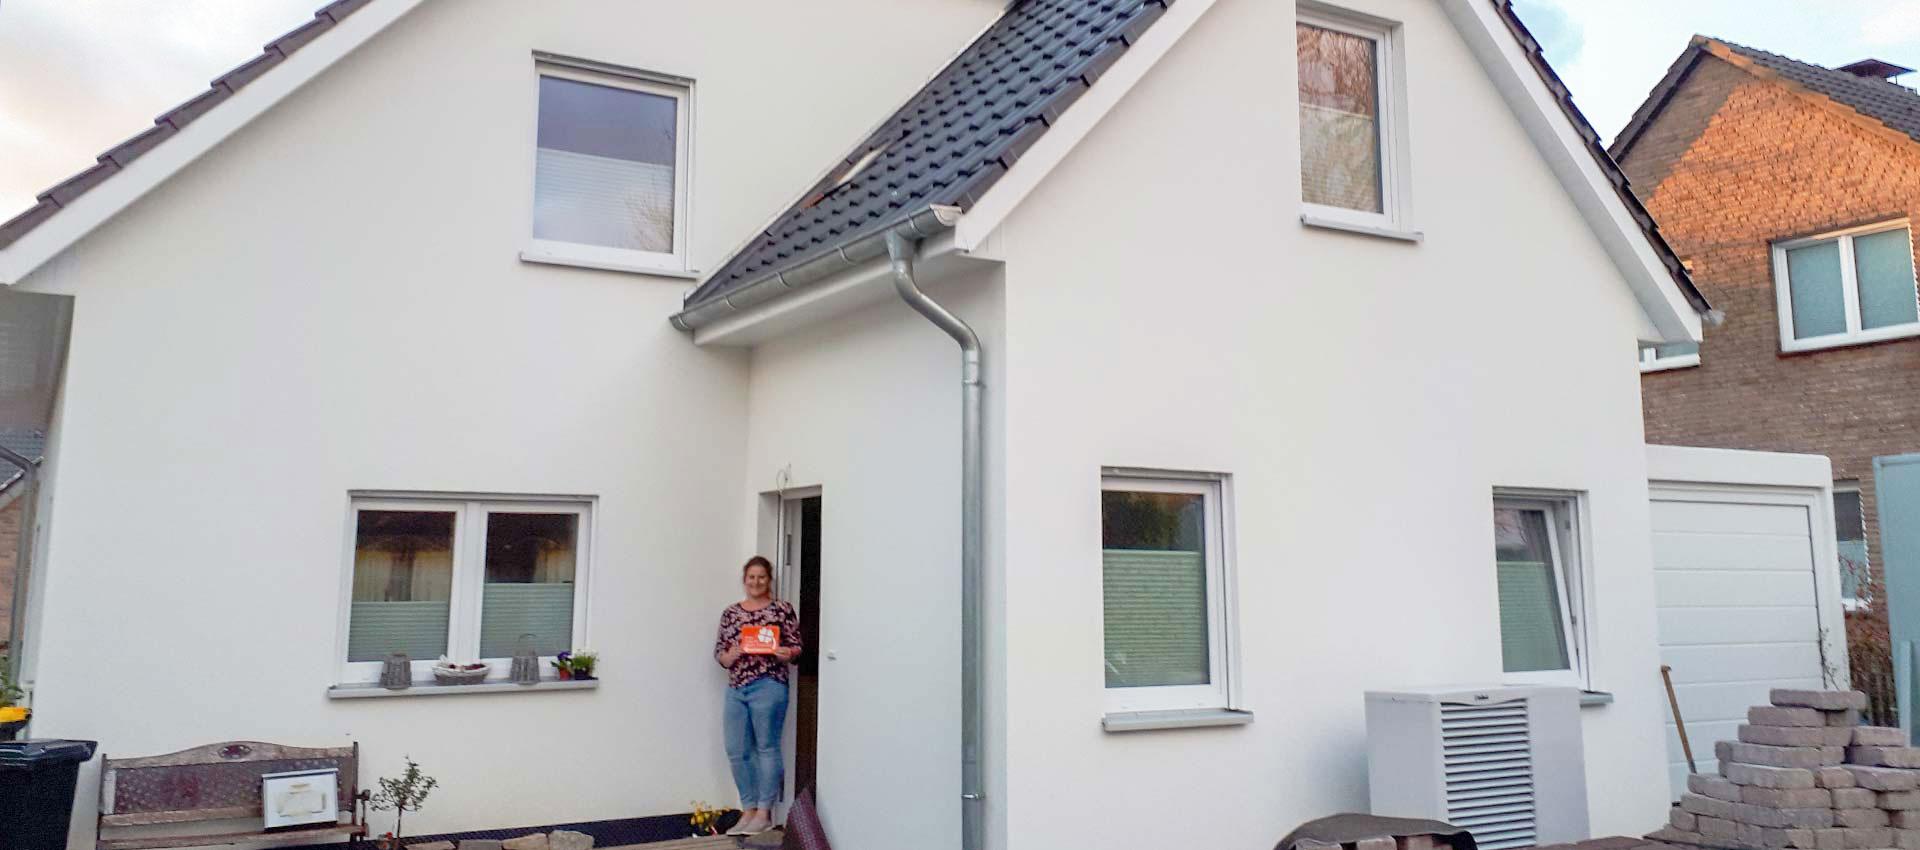 Haus im Bau PN2882